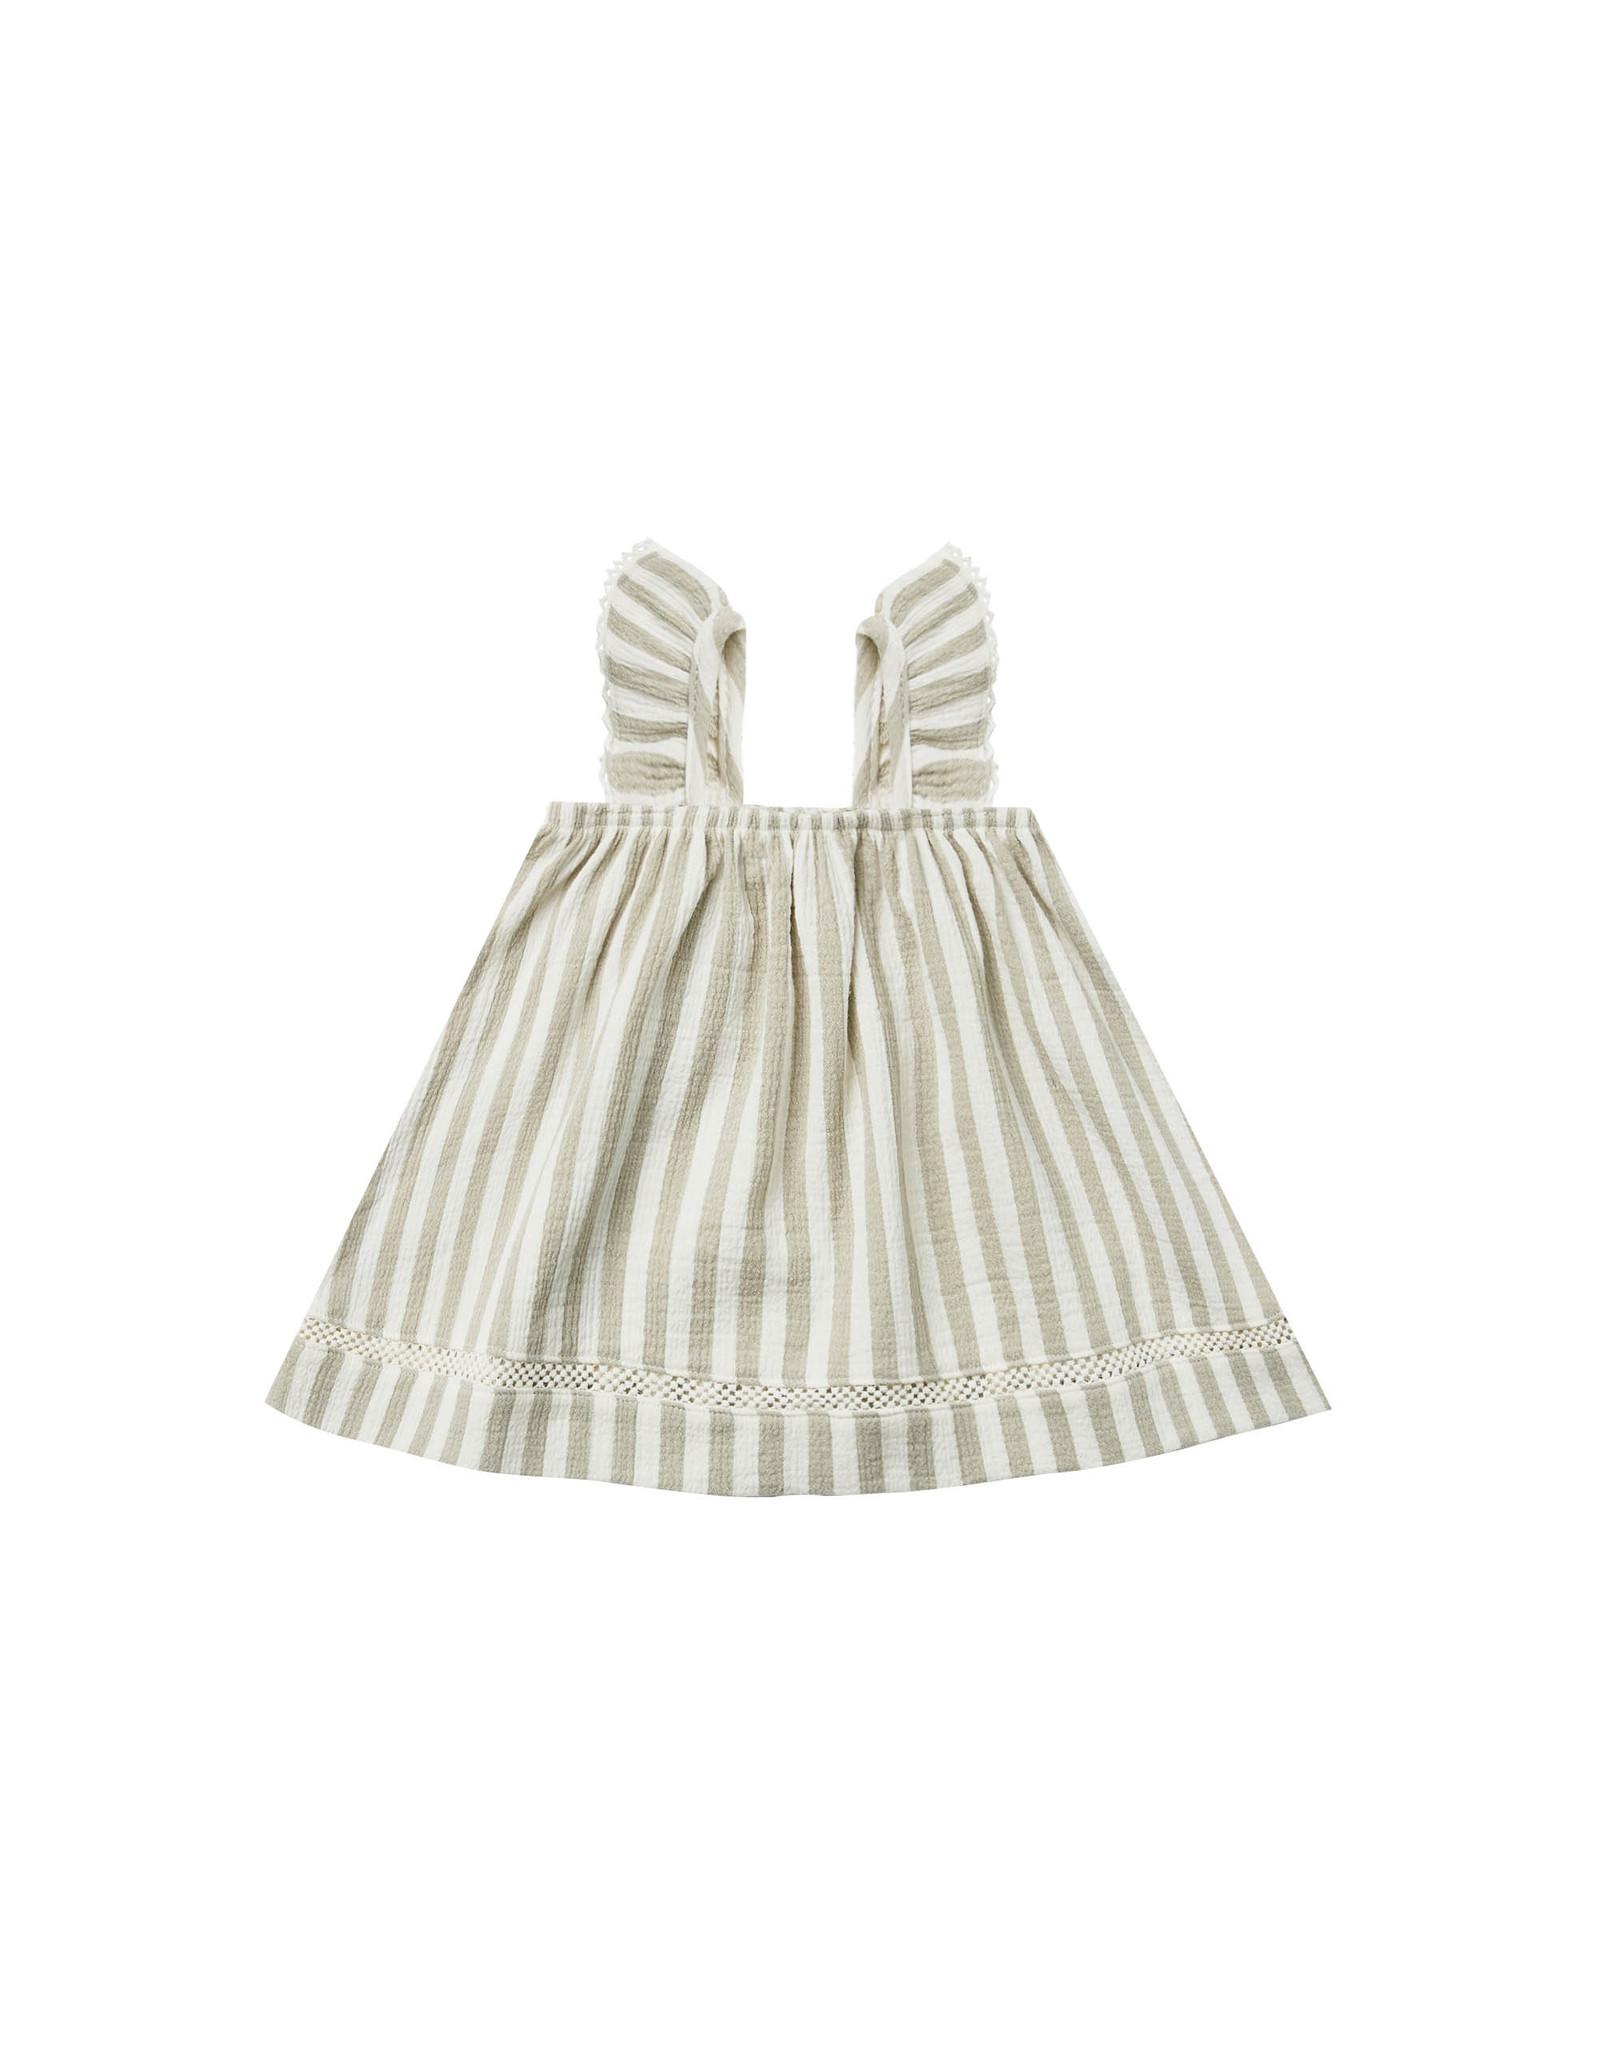 Quincy Mae Woven Ruffle Tube Dress